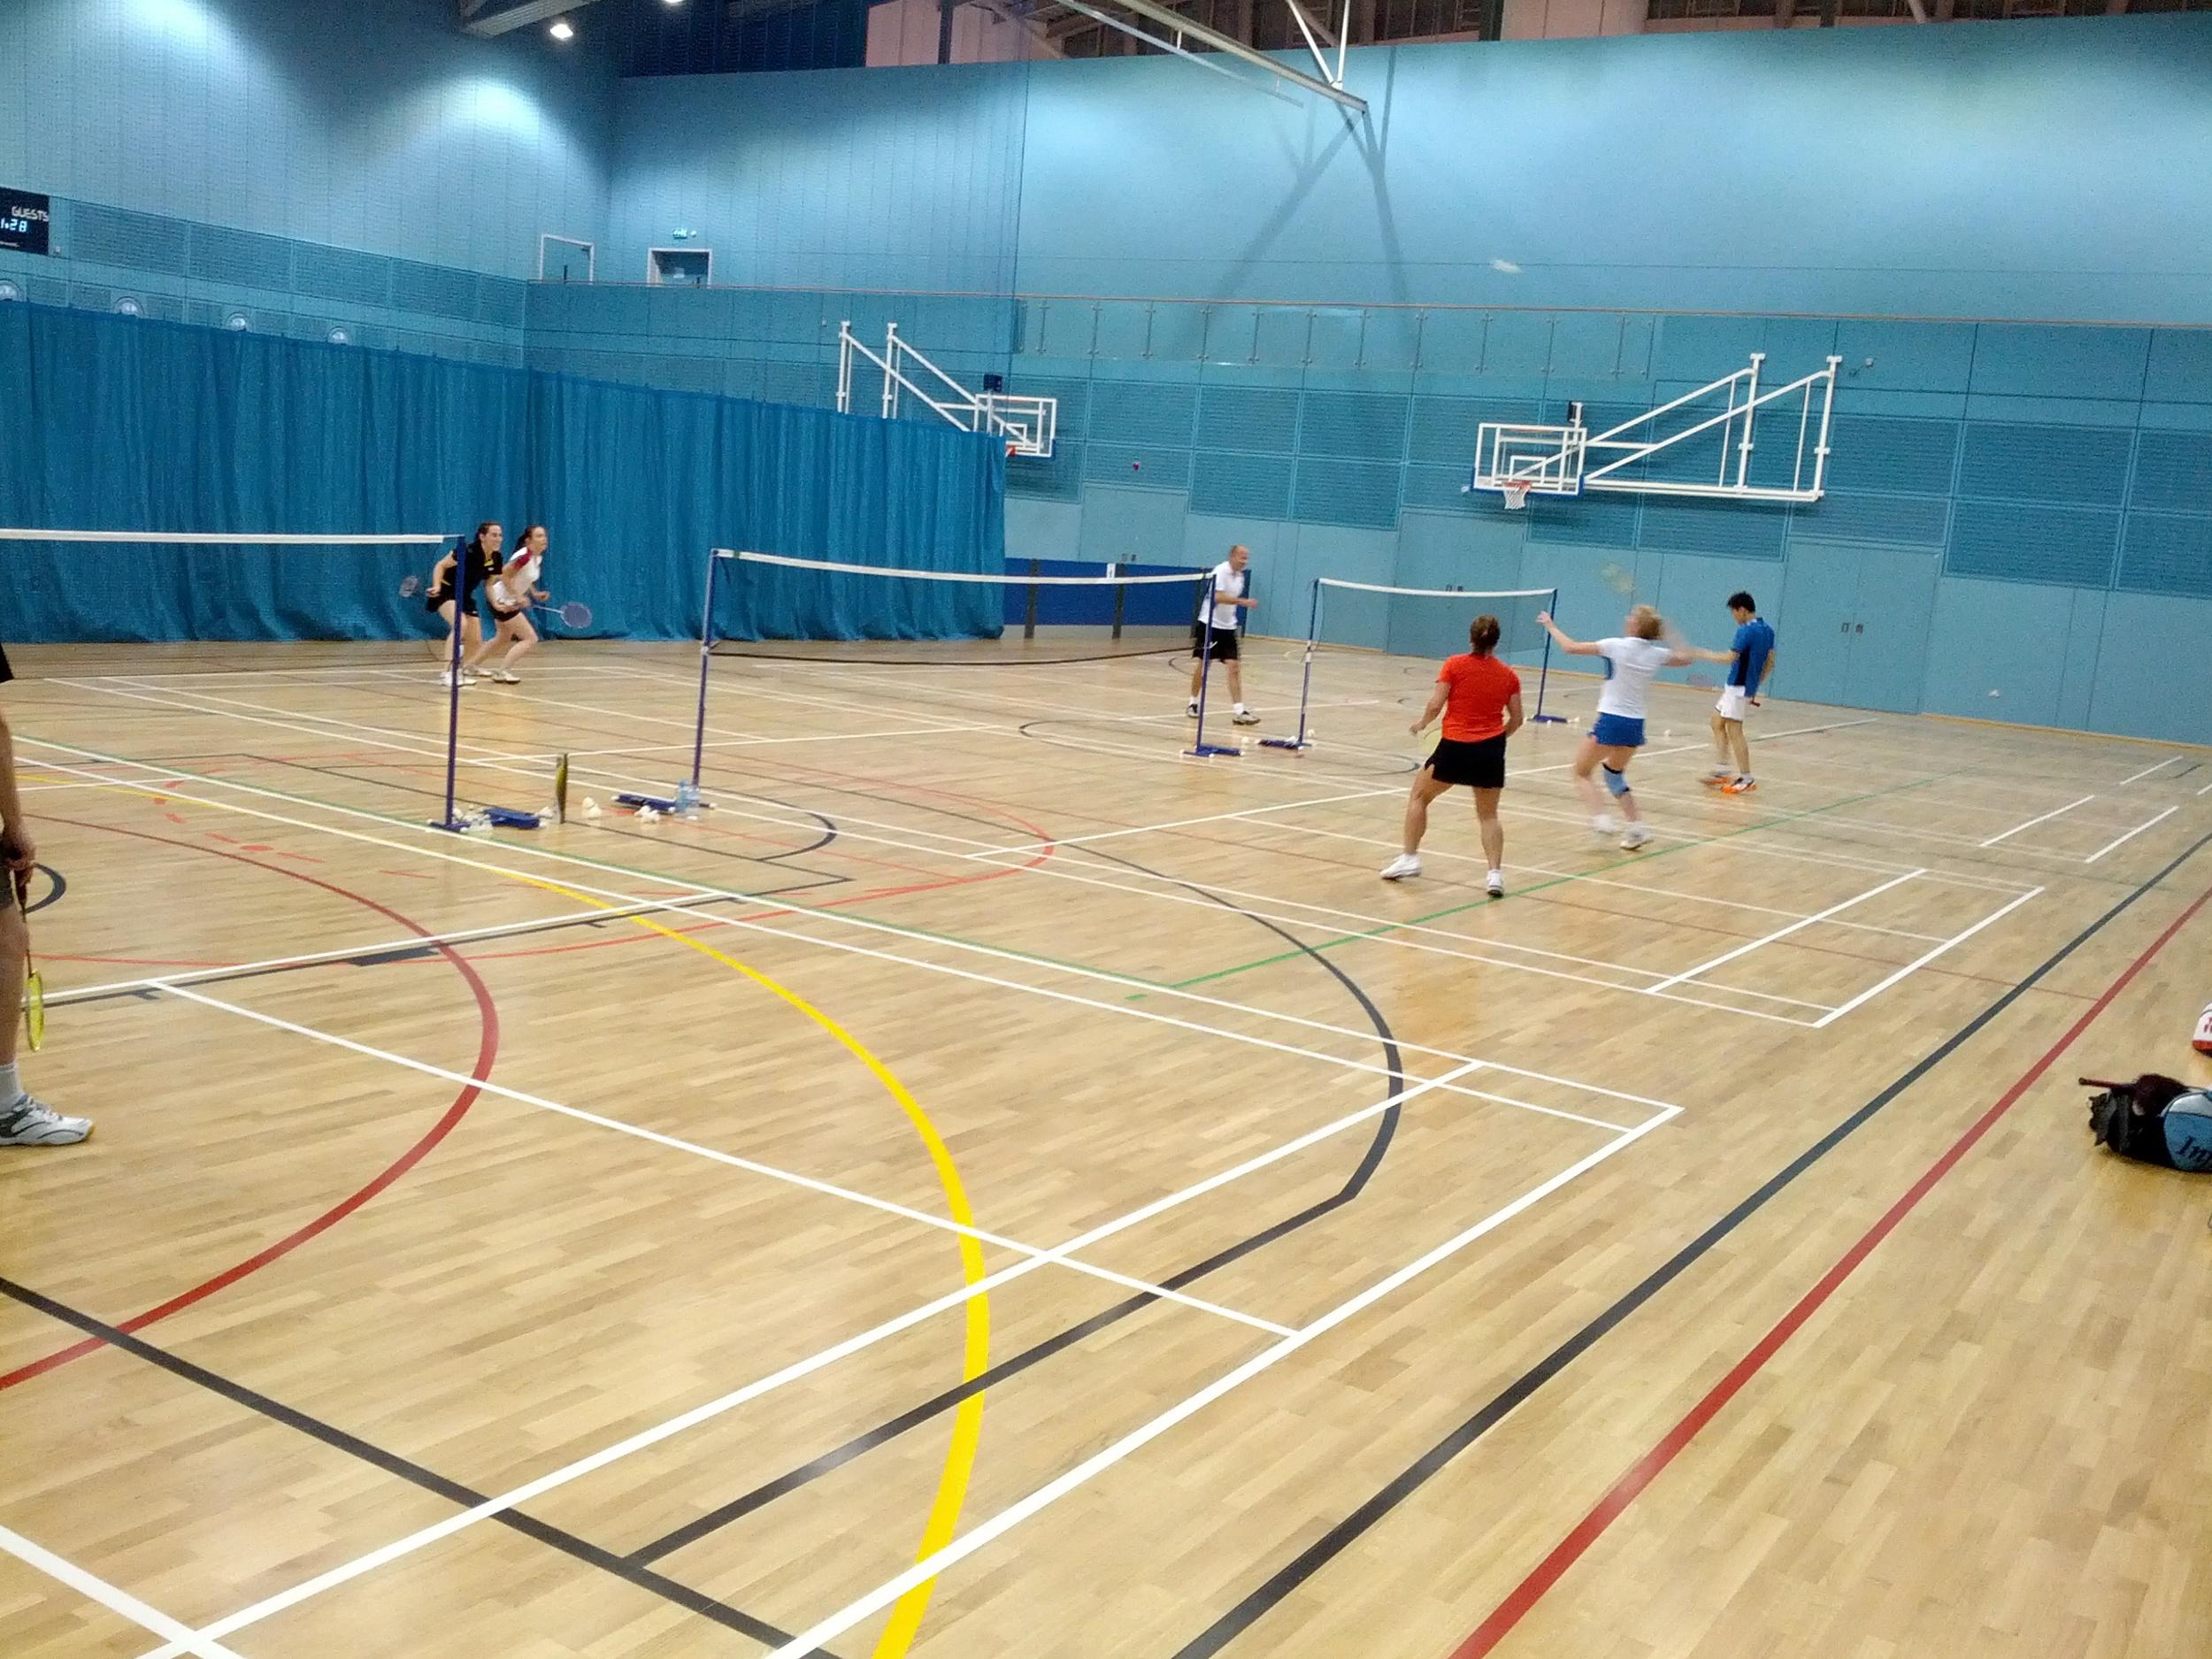 New University Sports Centre 2013